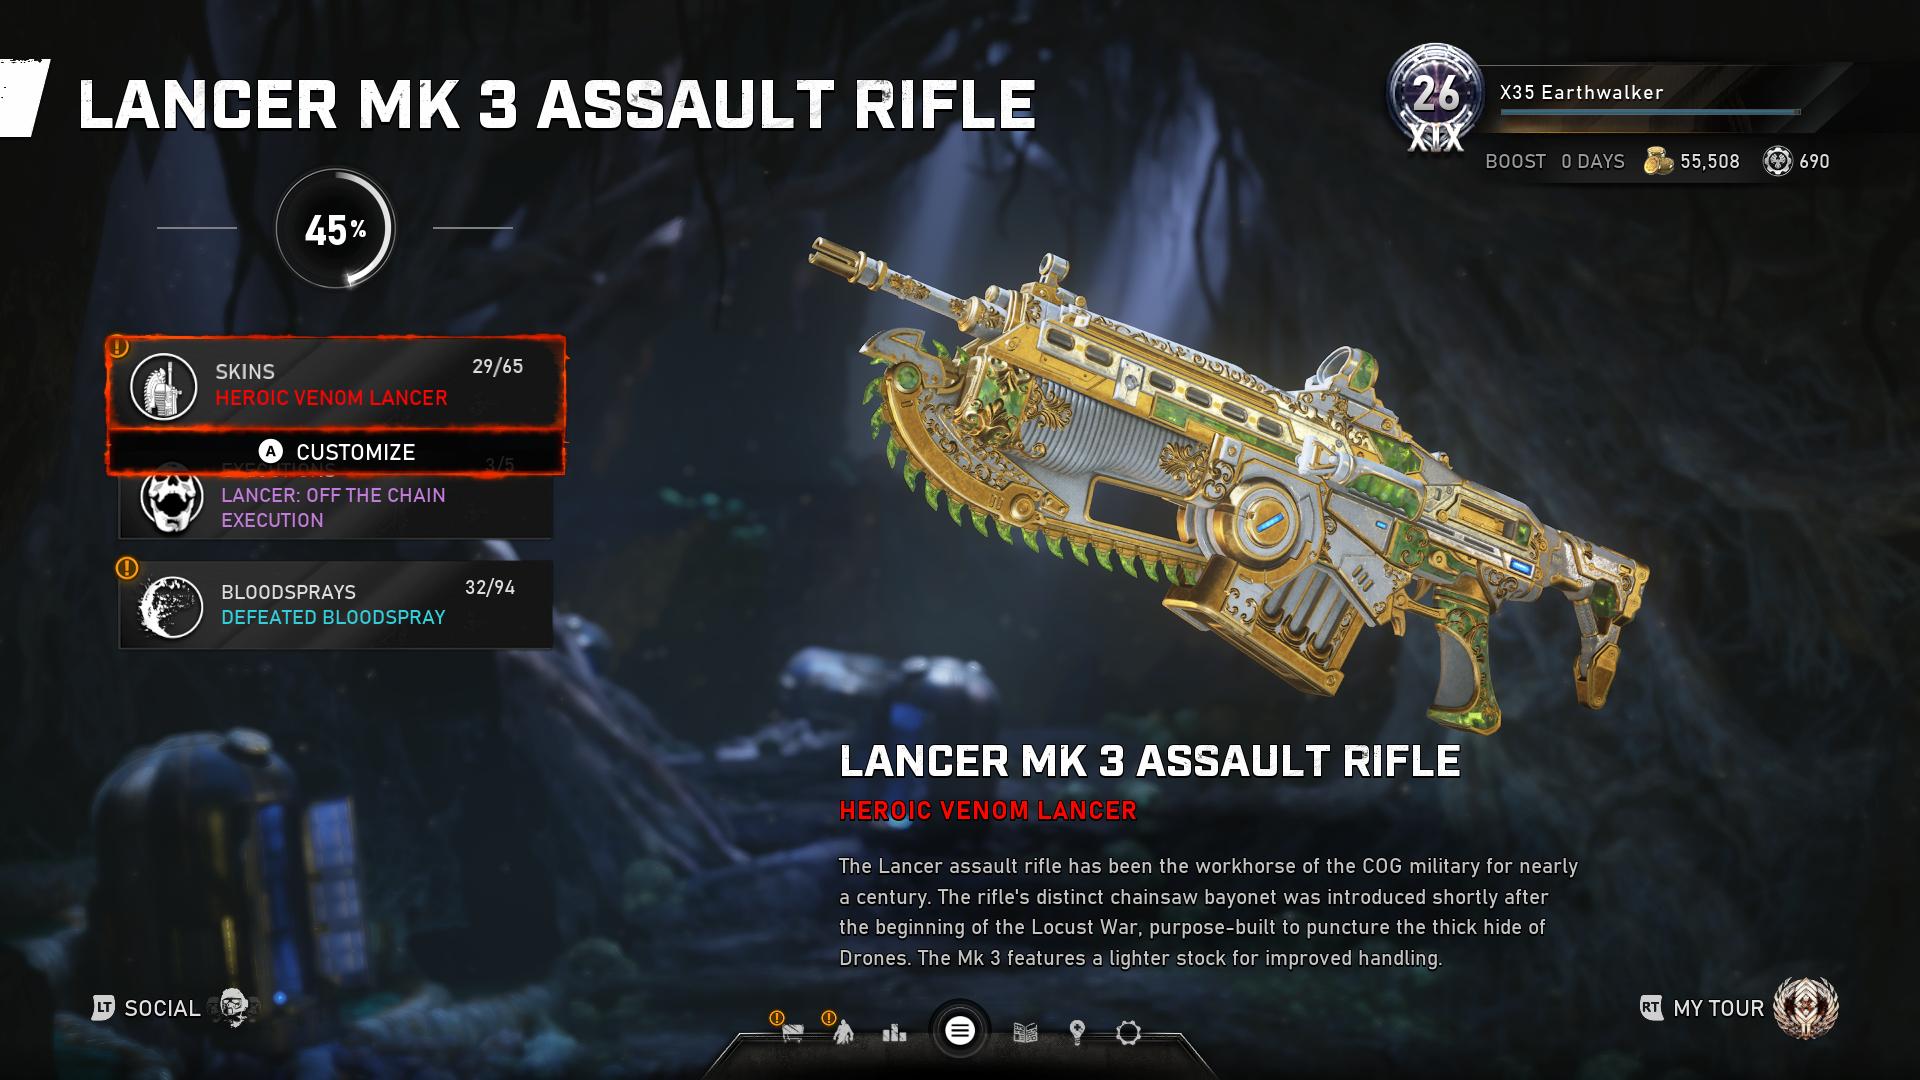 X35 Earthwalker. Gears 5 Lancer is terrible